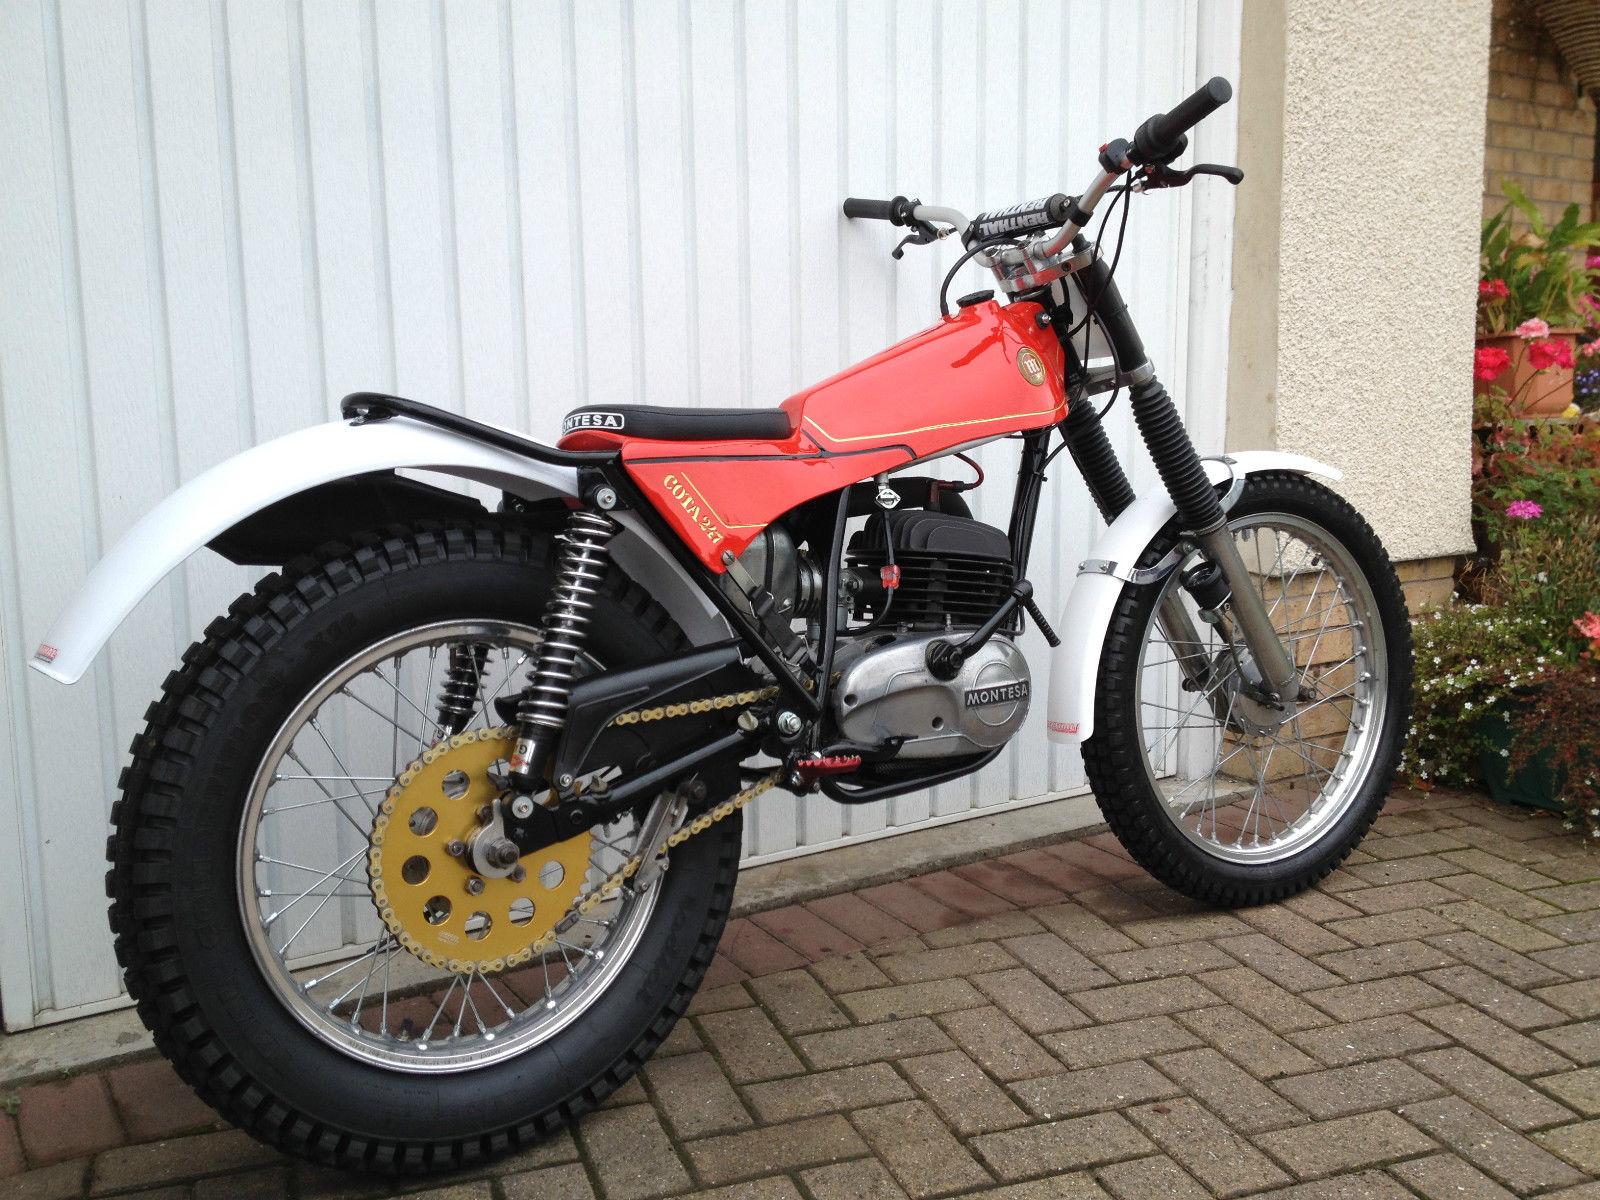 1979 Montesa Cota 247 Restored Trials Bike